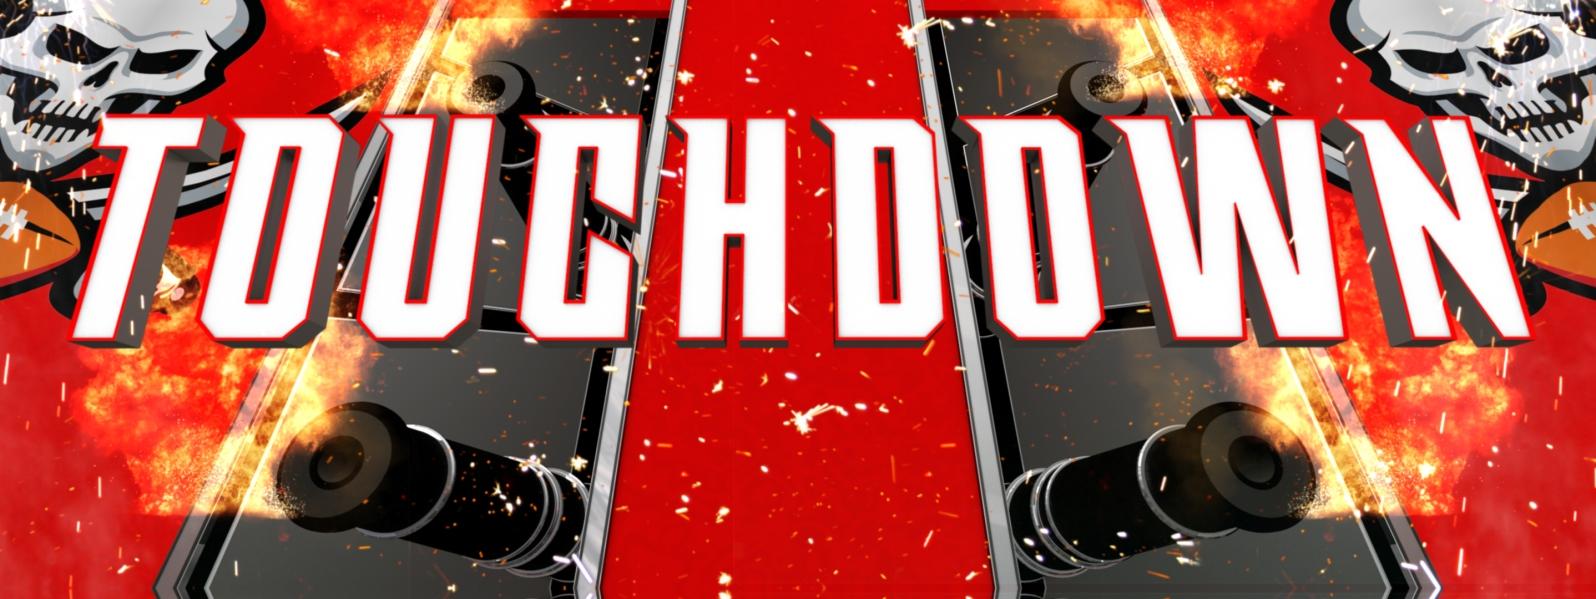 Tampa Bay Bucs - Touchdown -Marketing Image 3